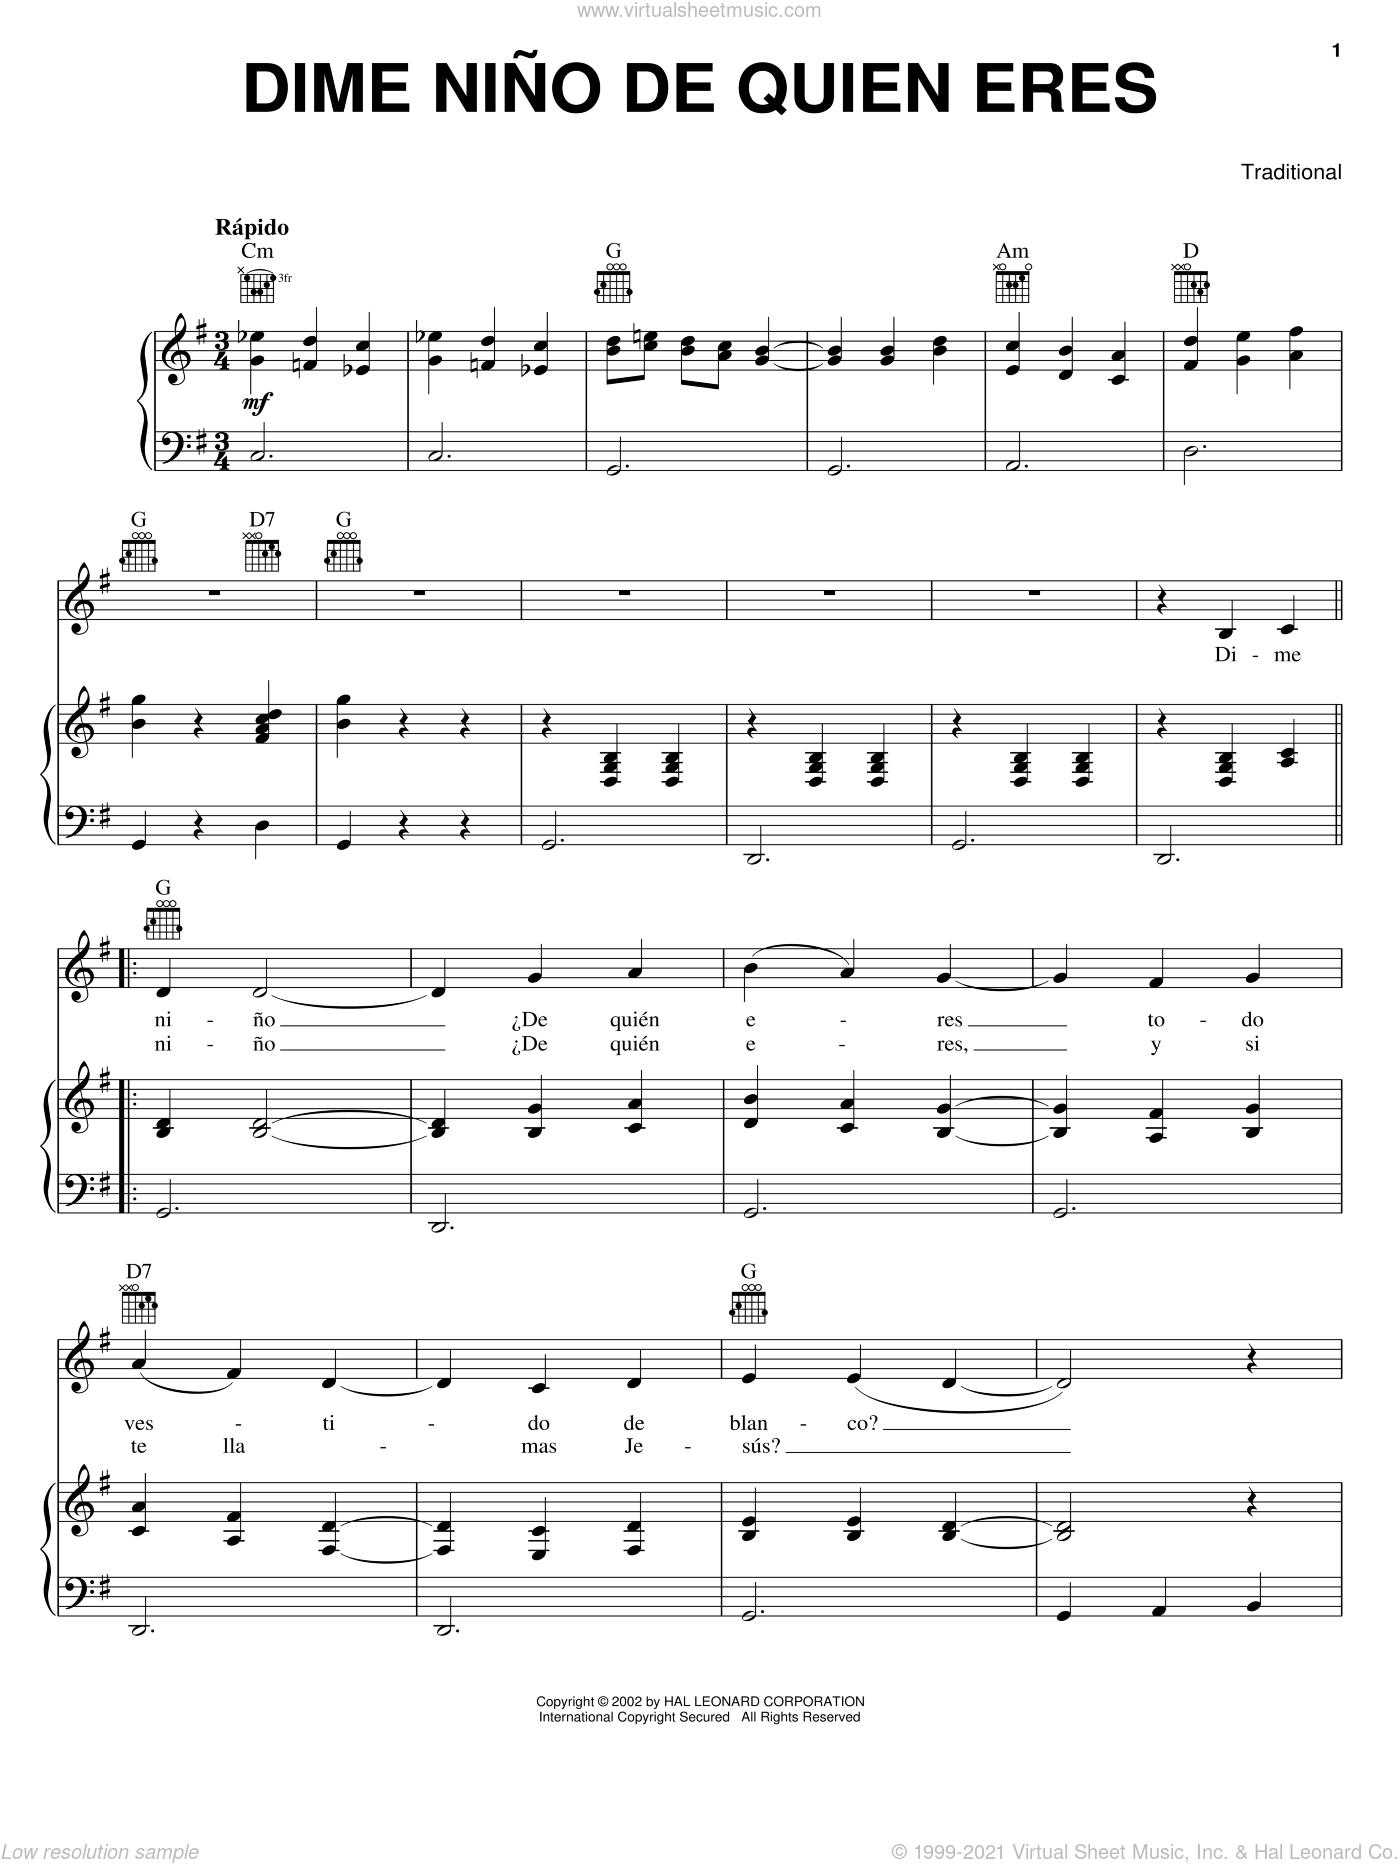 Dime Nino De Quien Eres sheet music for voice, piano or guitar, intermediate skill level